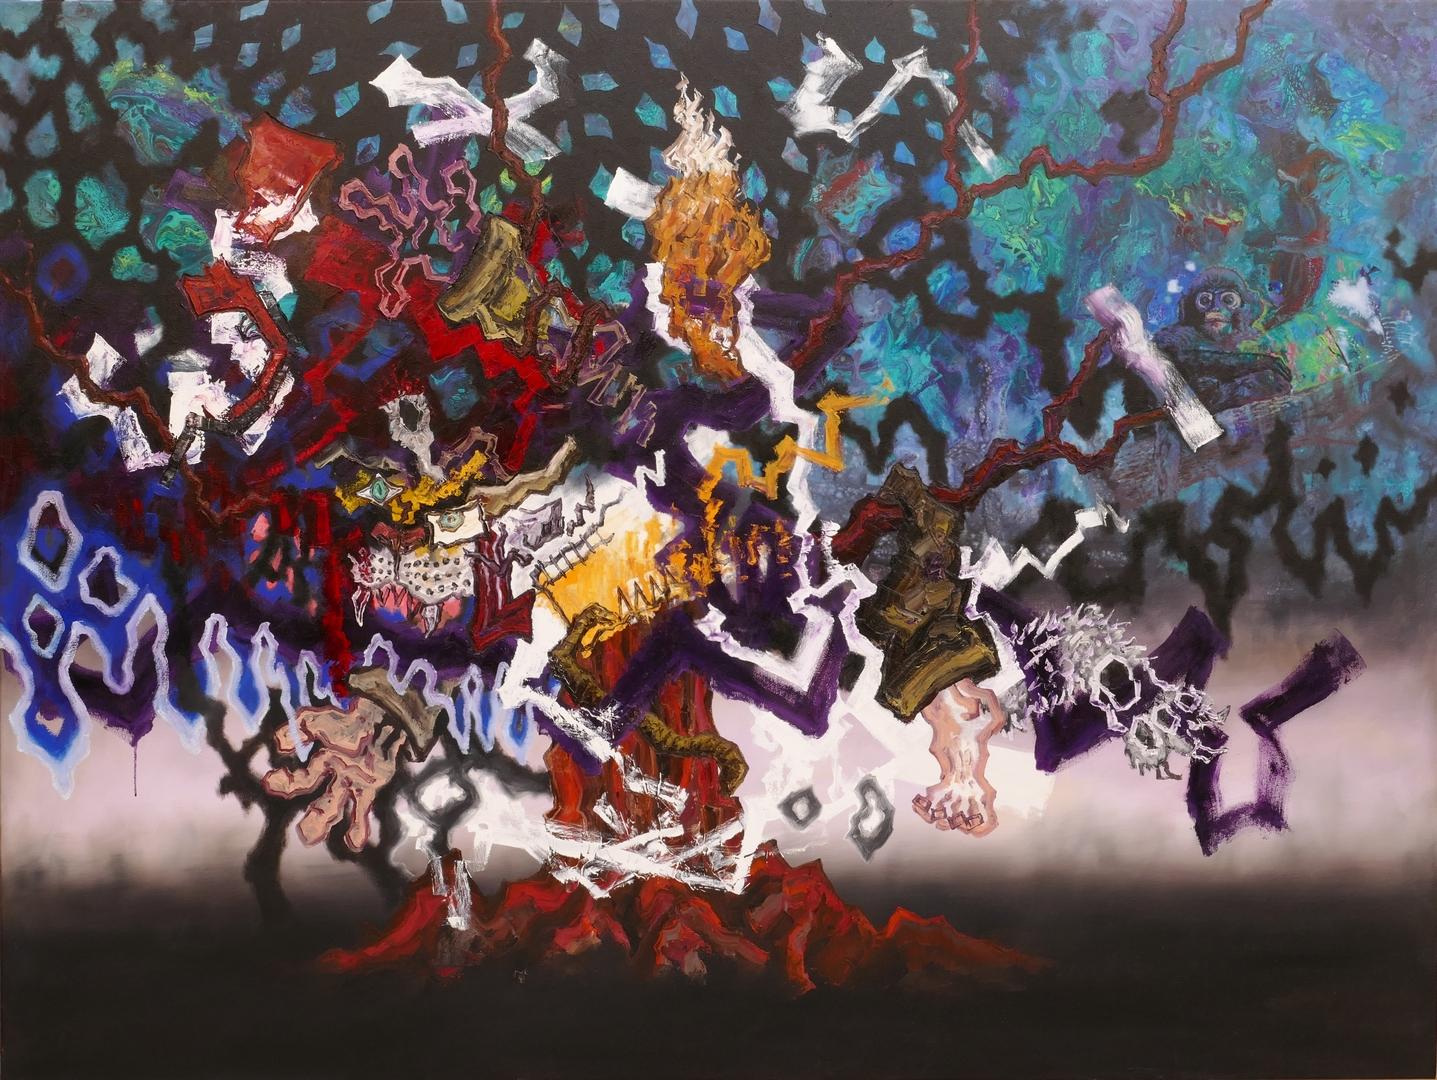 B, Baummensch V, 150x200cm, Öl, Acryl auf Leinwand,2020